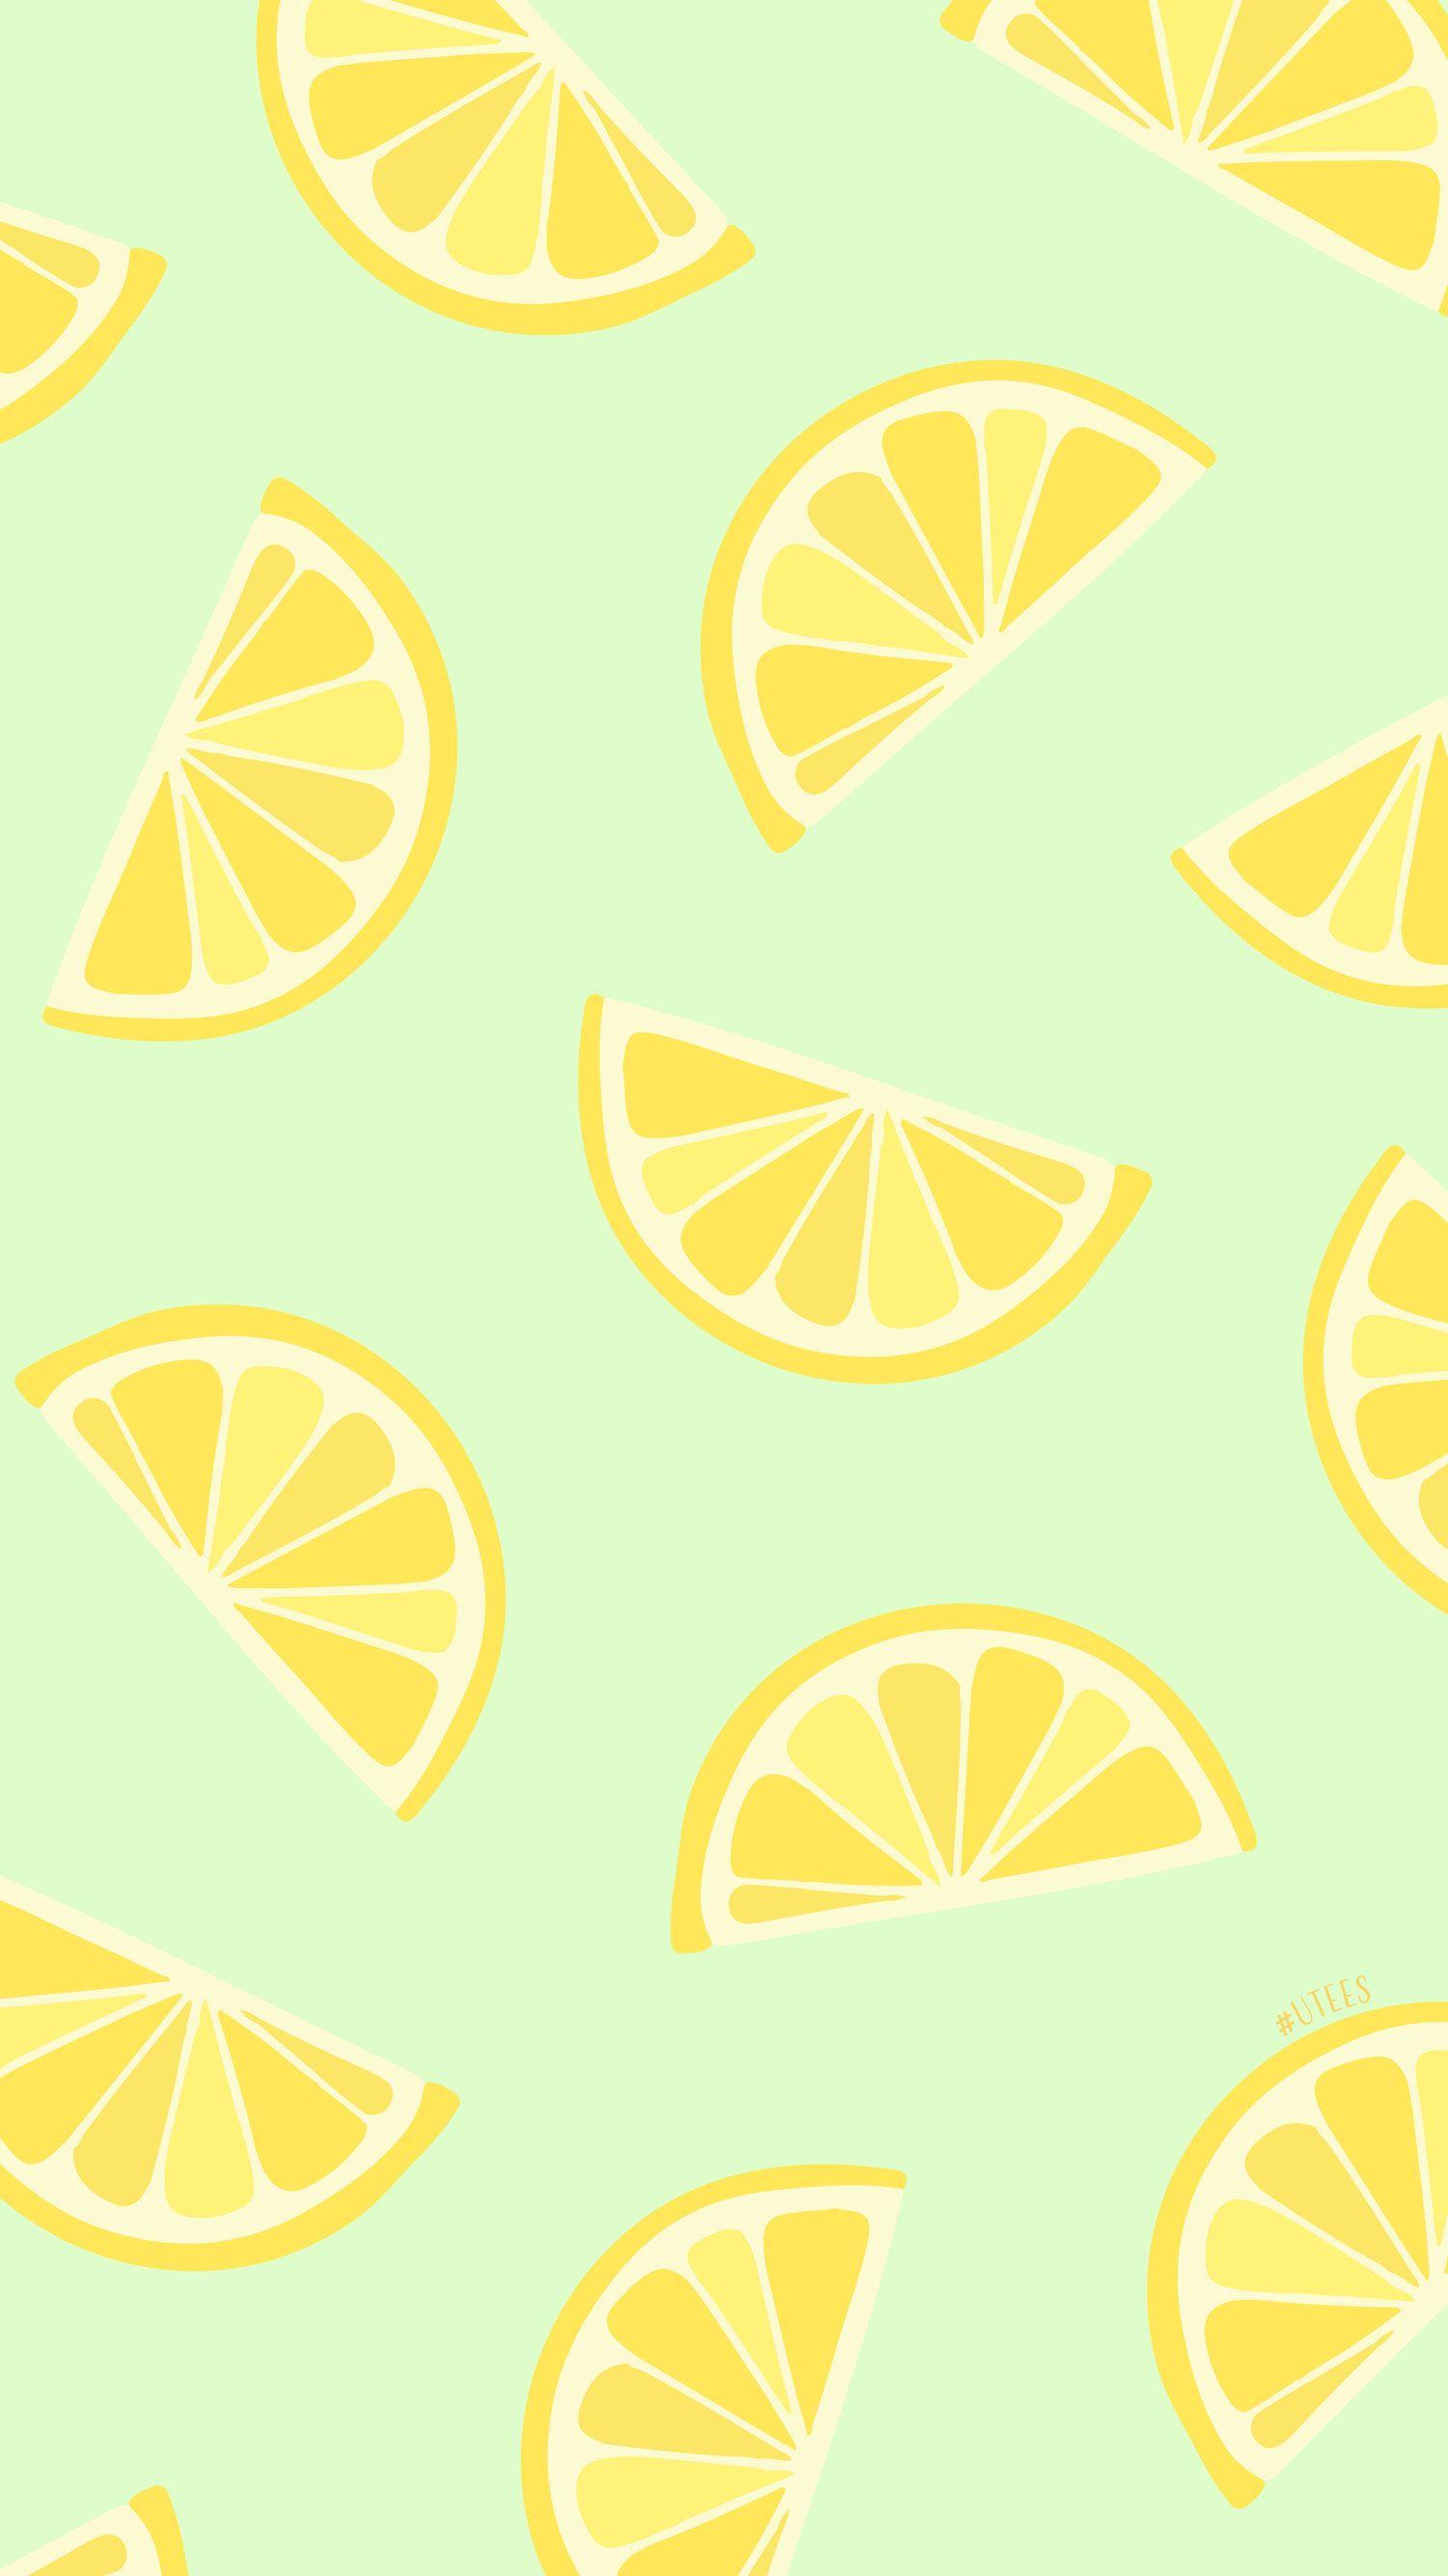 Sg Lemon3 01 Jpg Cute Backgrounds For Iphone Cute Summer Wallpapers Wallpaper Iphone Summer